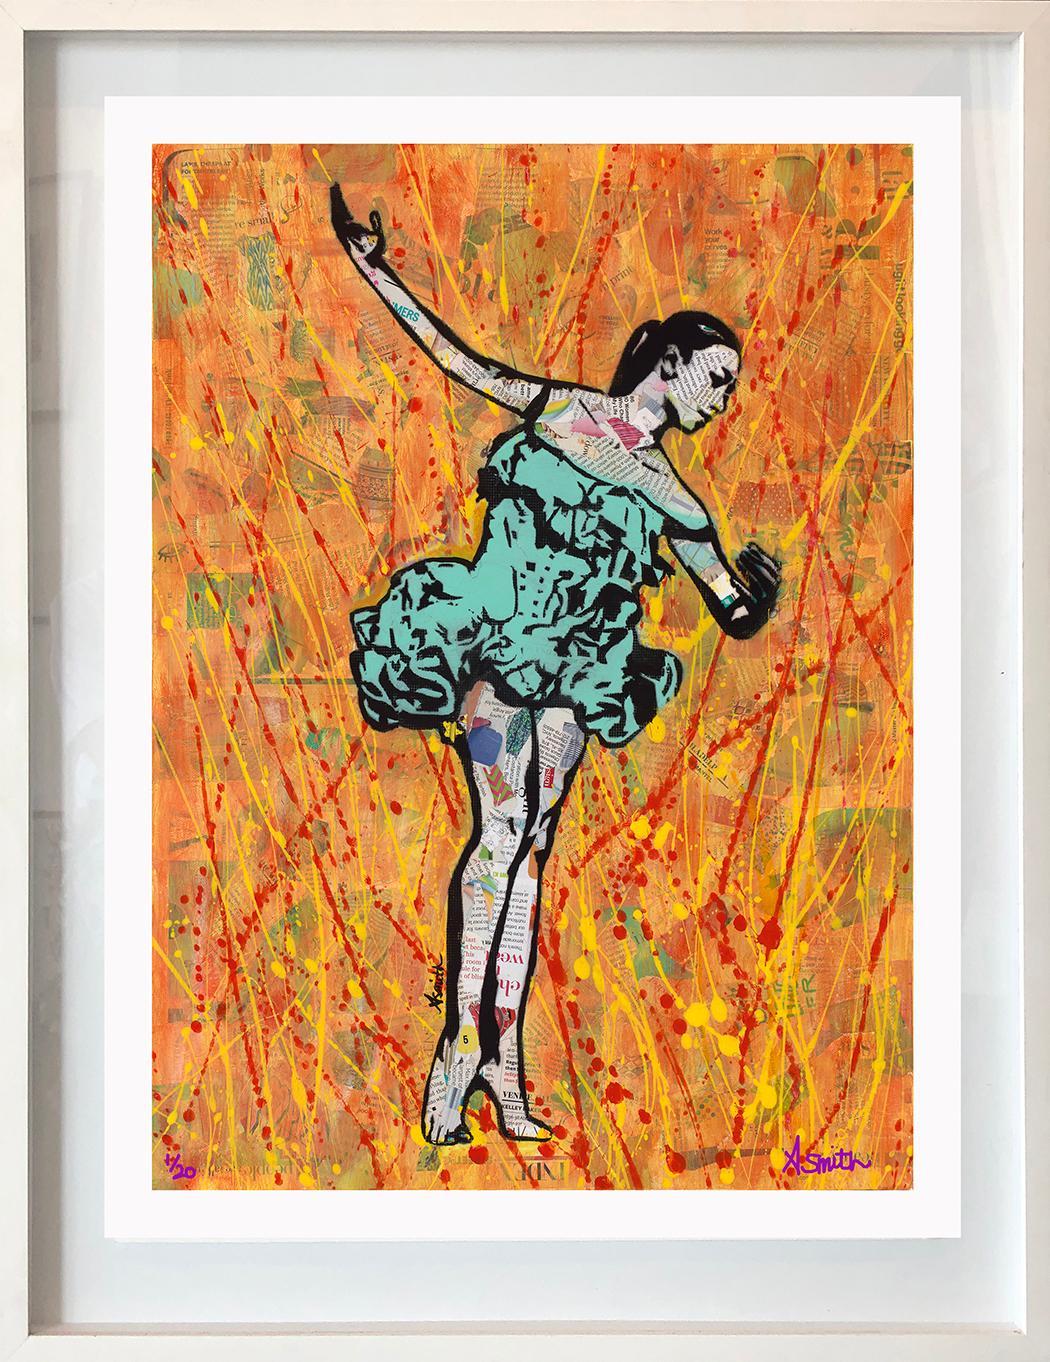 Fire Dancer - Framed Contemporary Pop Art Print of Ballet  + Orange and Teal